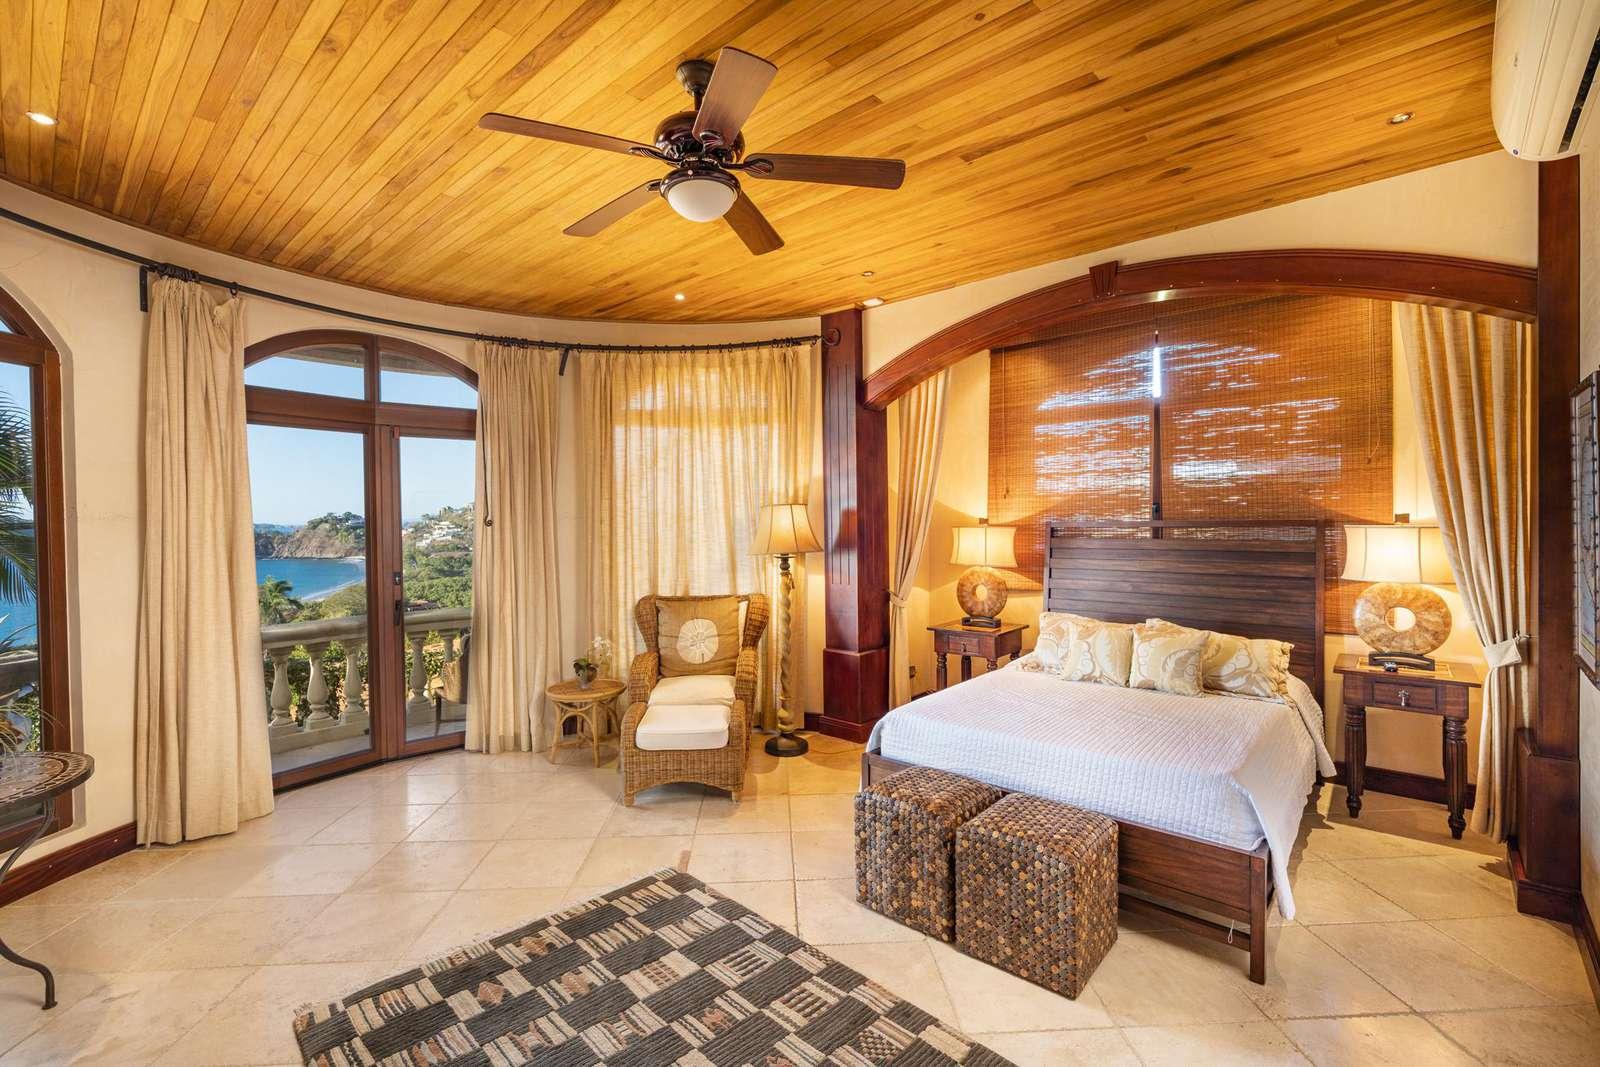 Guest bedroom, queen bed, main level, private bathroom